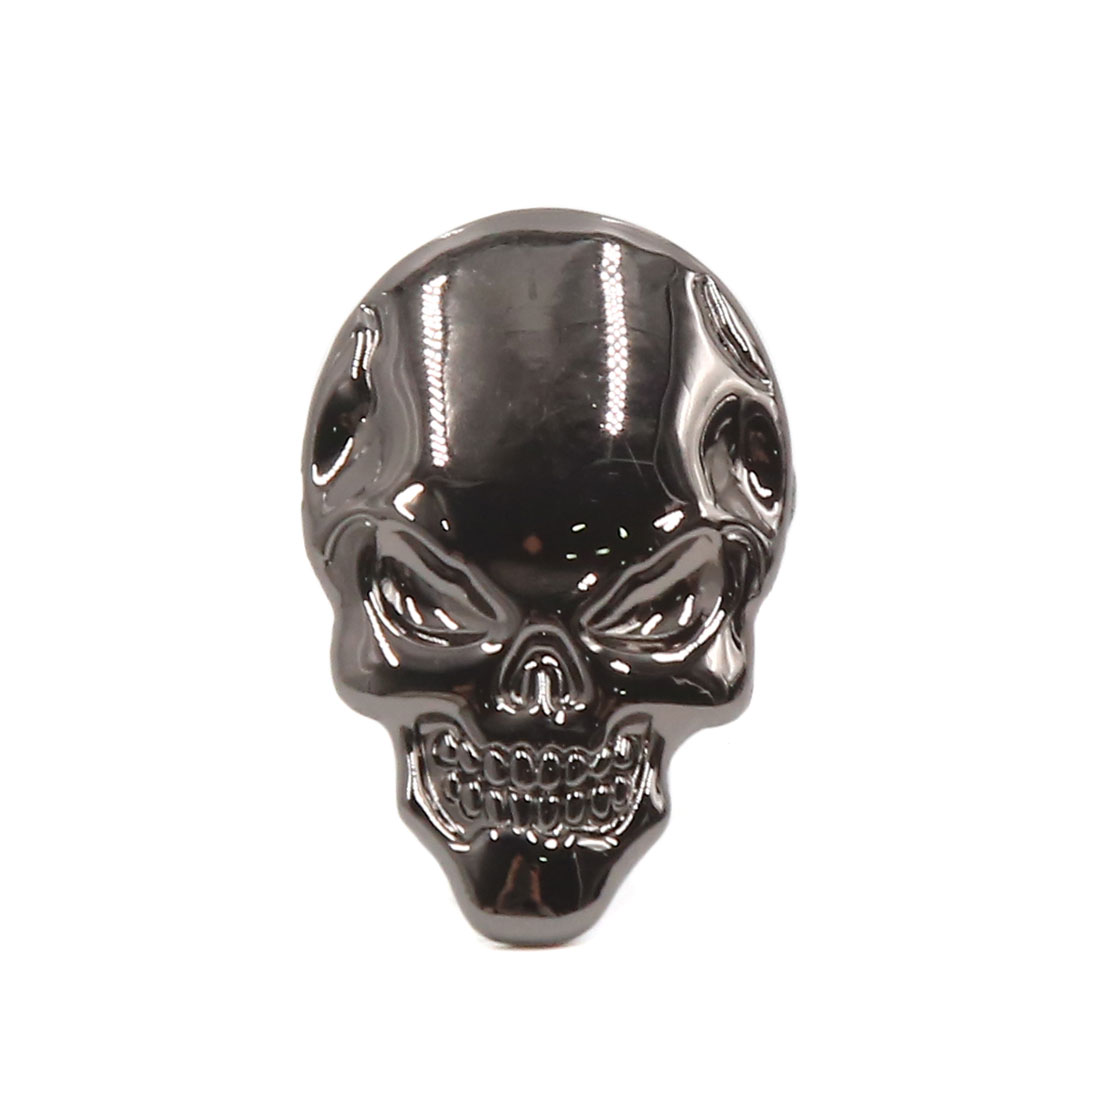 Car Motorcycle 3D Metal Emblem Badge Decal Skeleton Skull Bone Shaped Sticker